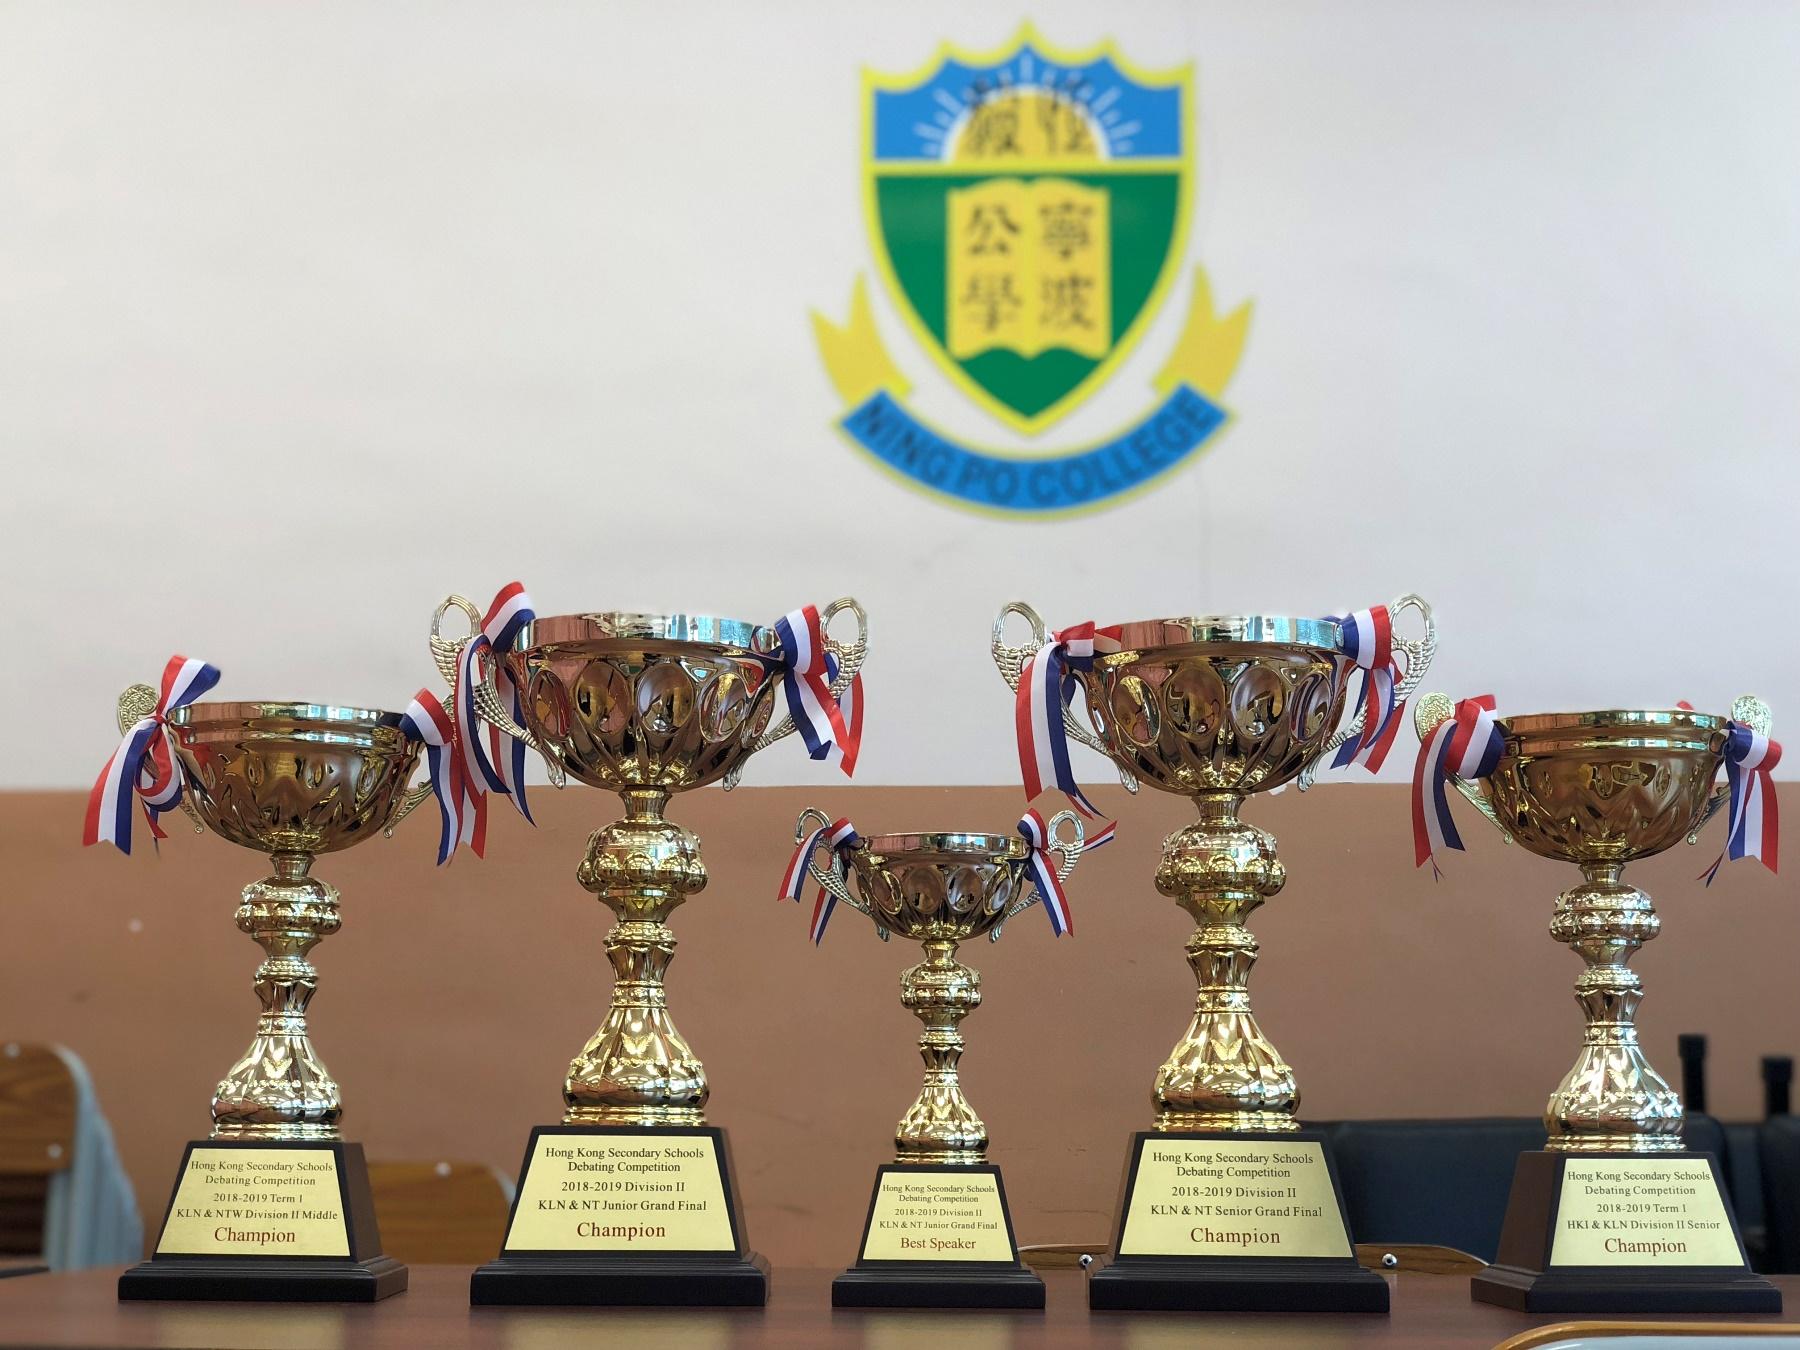 http://npc.edu.hk/sites/default/files/3_group_whole_year_trophies.jpg